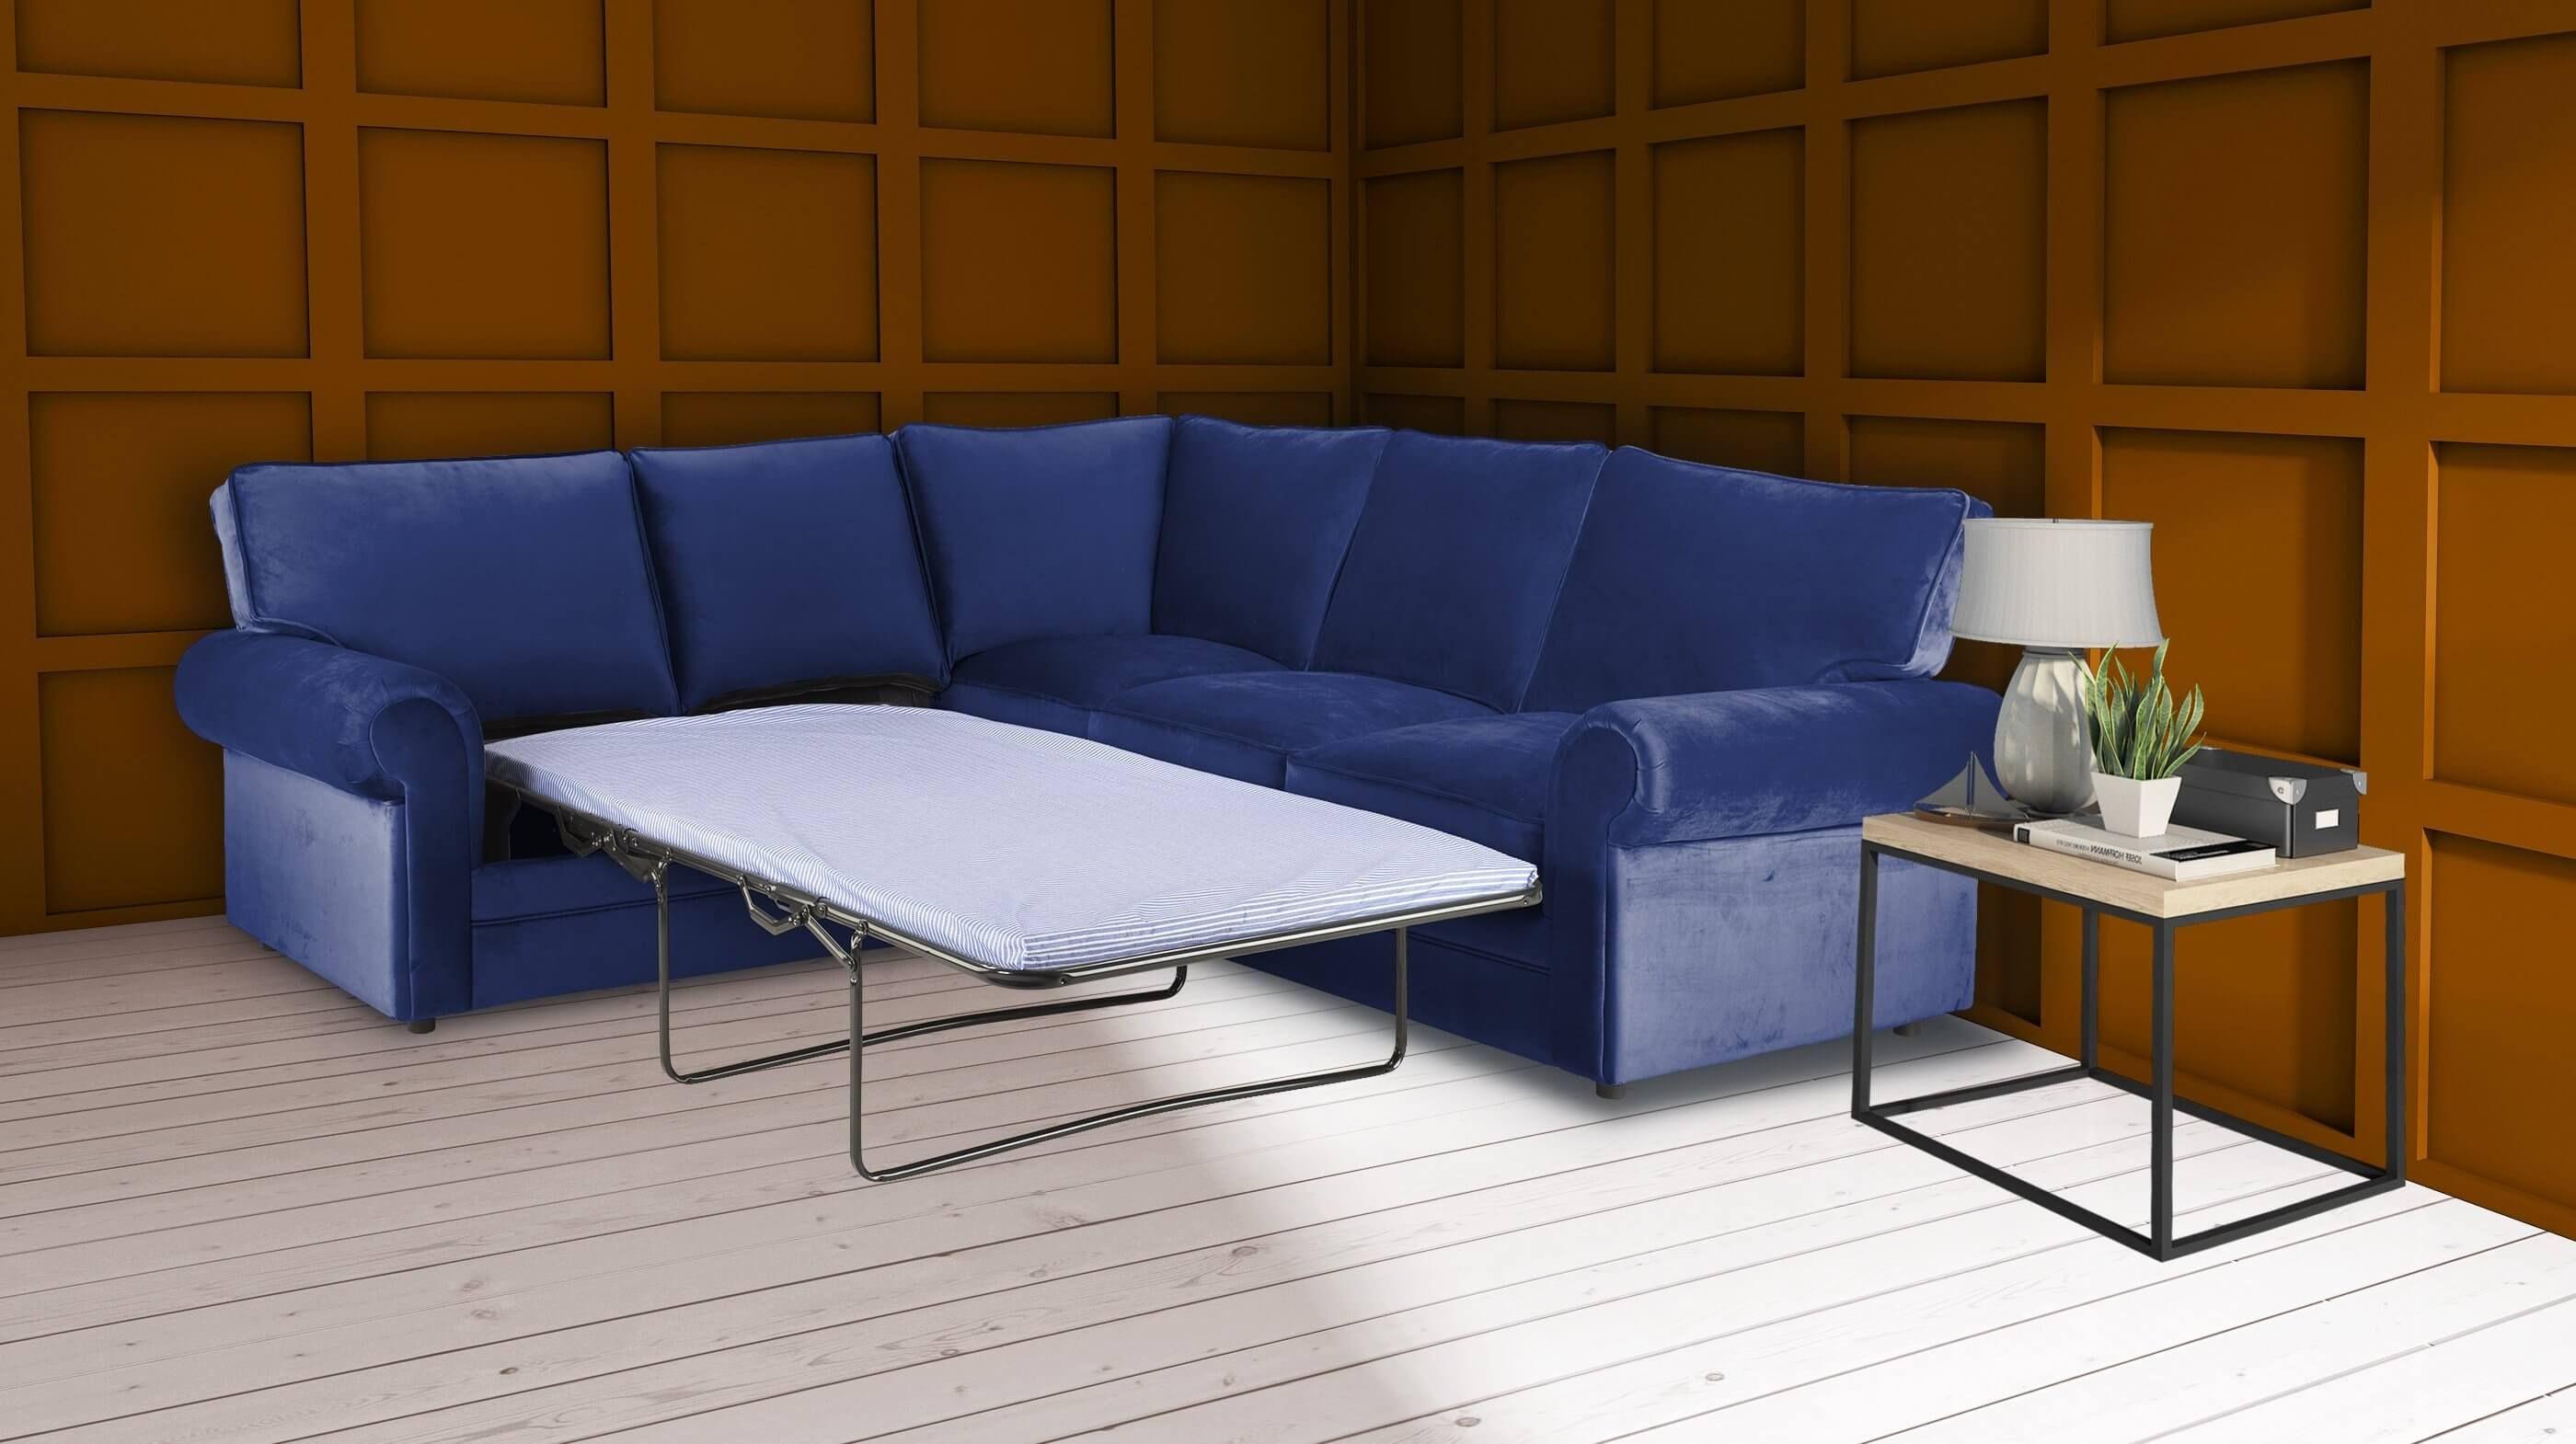 49 Reference Of Blue Chesterfield Sofa Bed In 2020 Beige Sofa Living Room Corner Sofa Living Room Black Corner Sofa